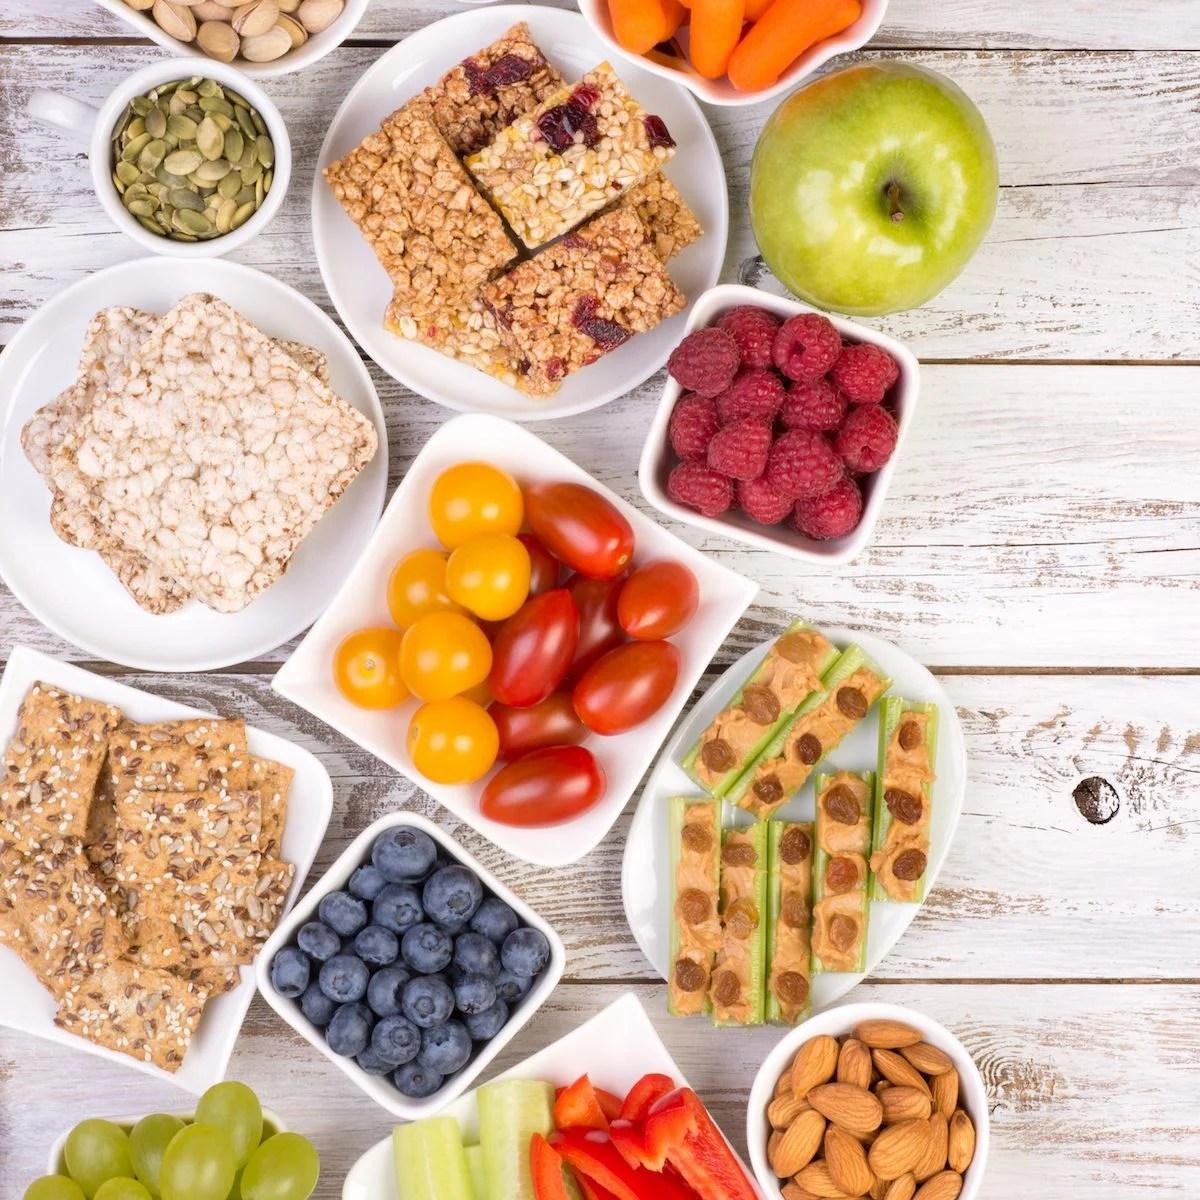 Healthy Foods That Help You Feel Full